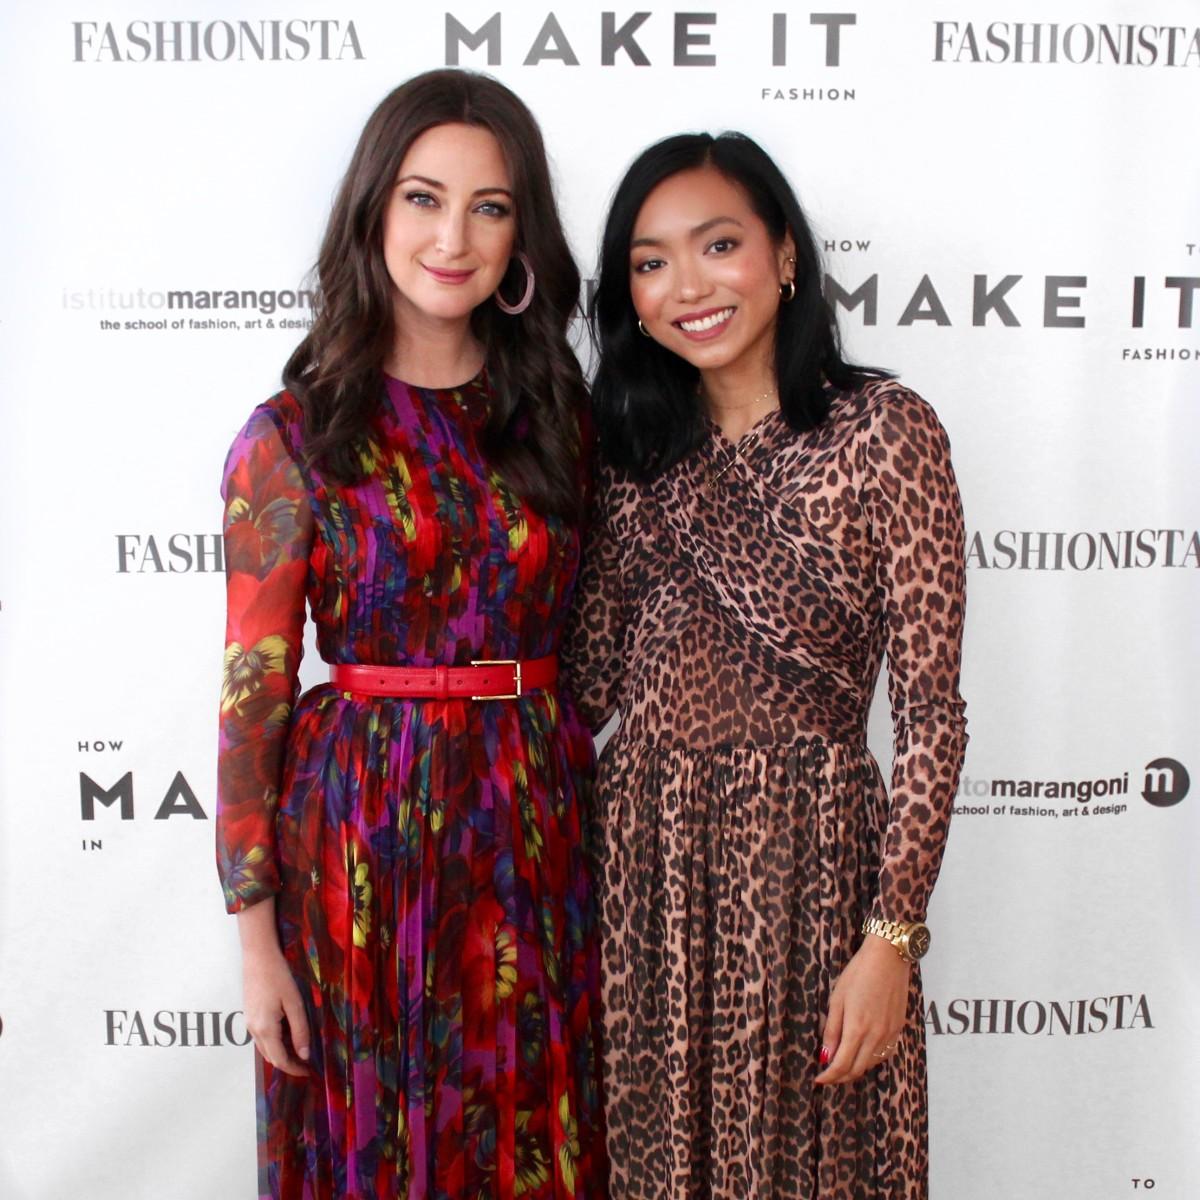 Stylist Micaela Erlanger with Fashionista Associate Editor Maria Bobila. Photo: Tonya Mann